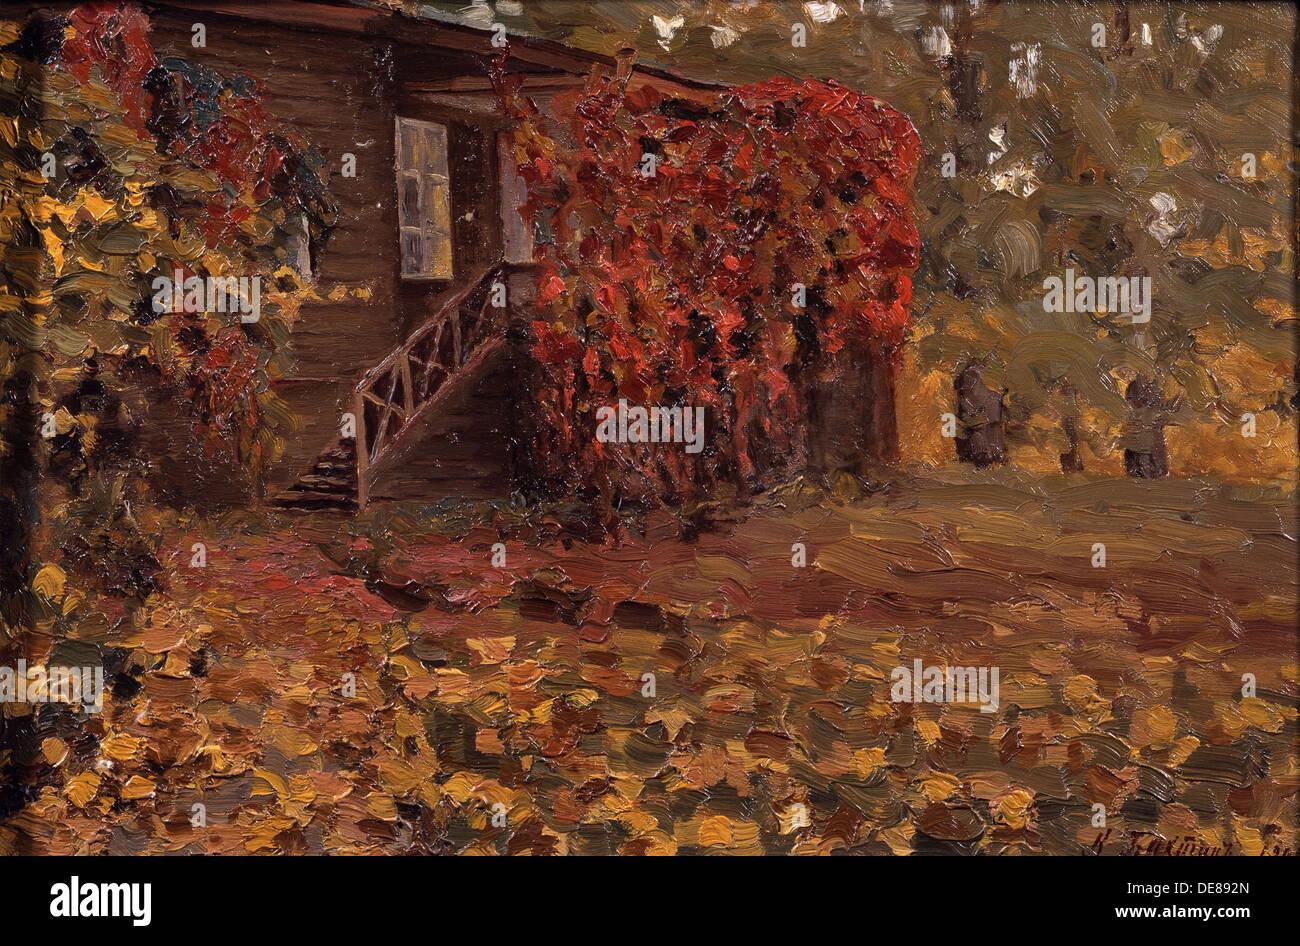 Un paese abbandonato casa, 1909. Artista: Bakhtin, Konstantin Nikolayevich (1873-dopo il 1928) Immagini Stock